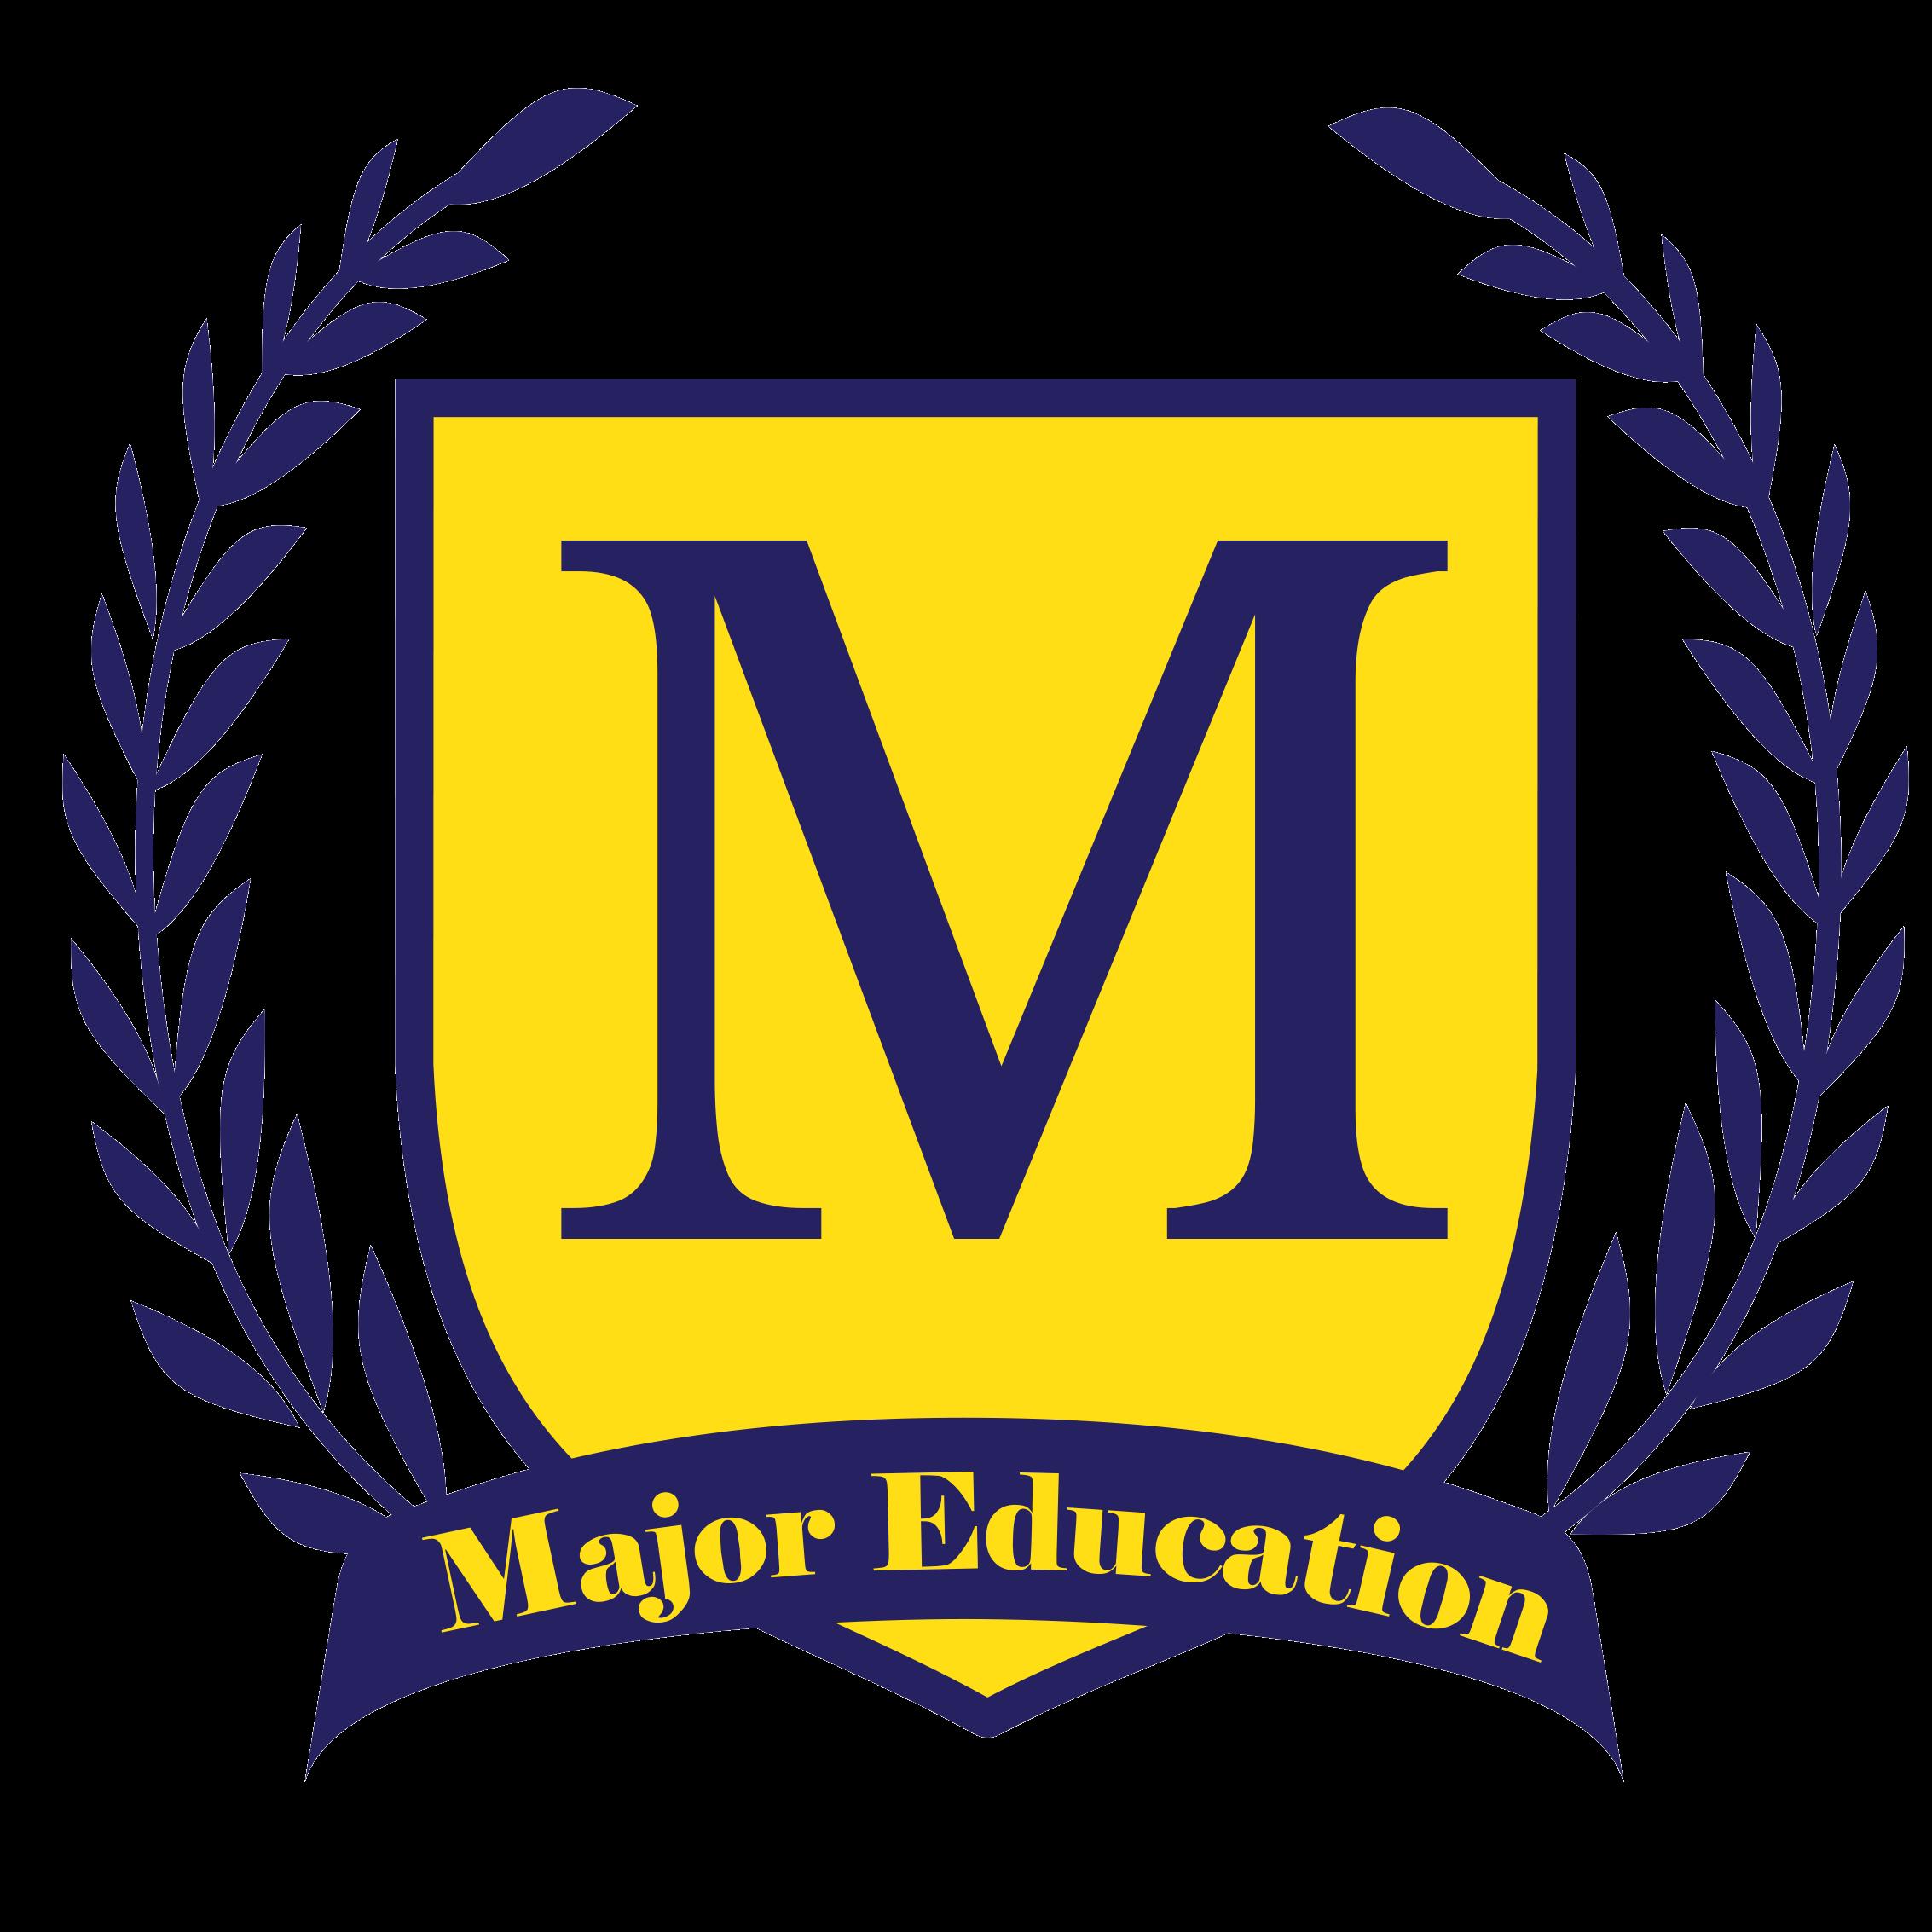 Major Education